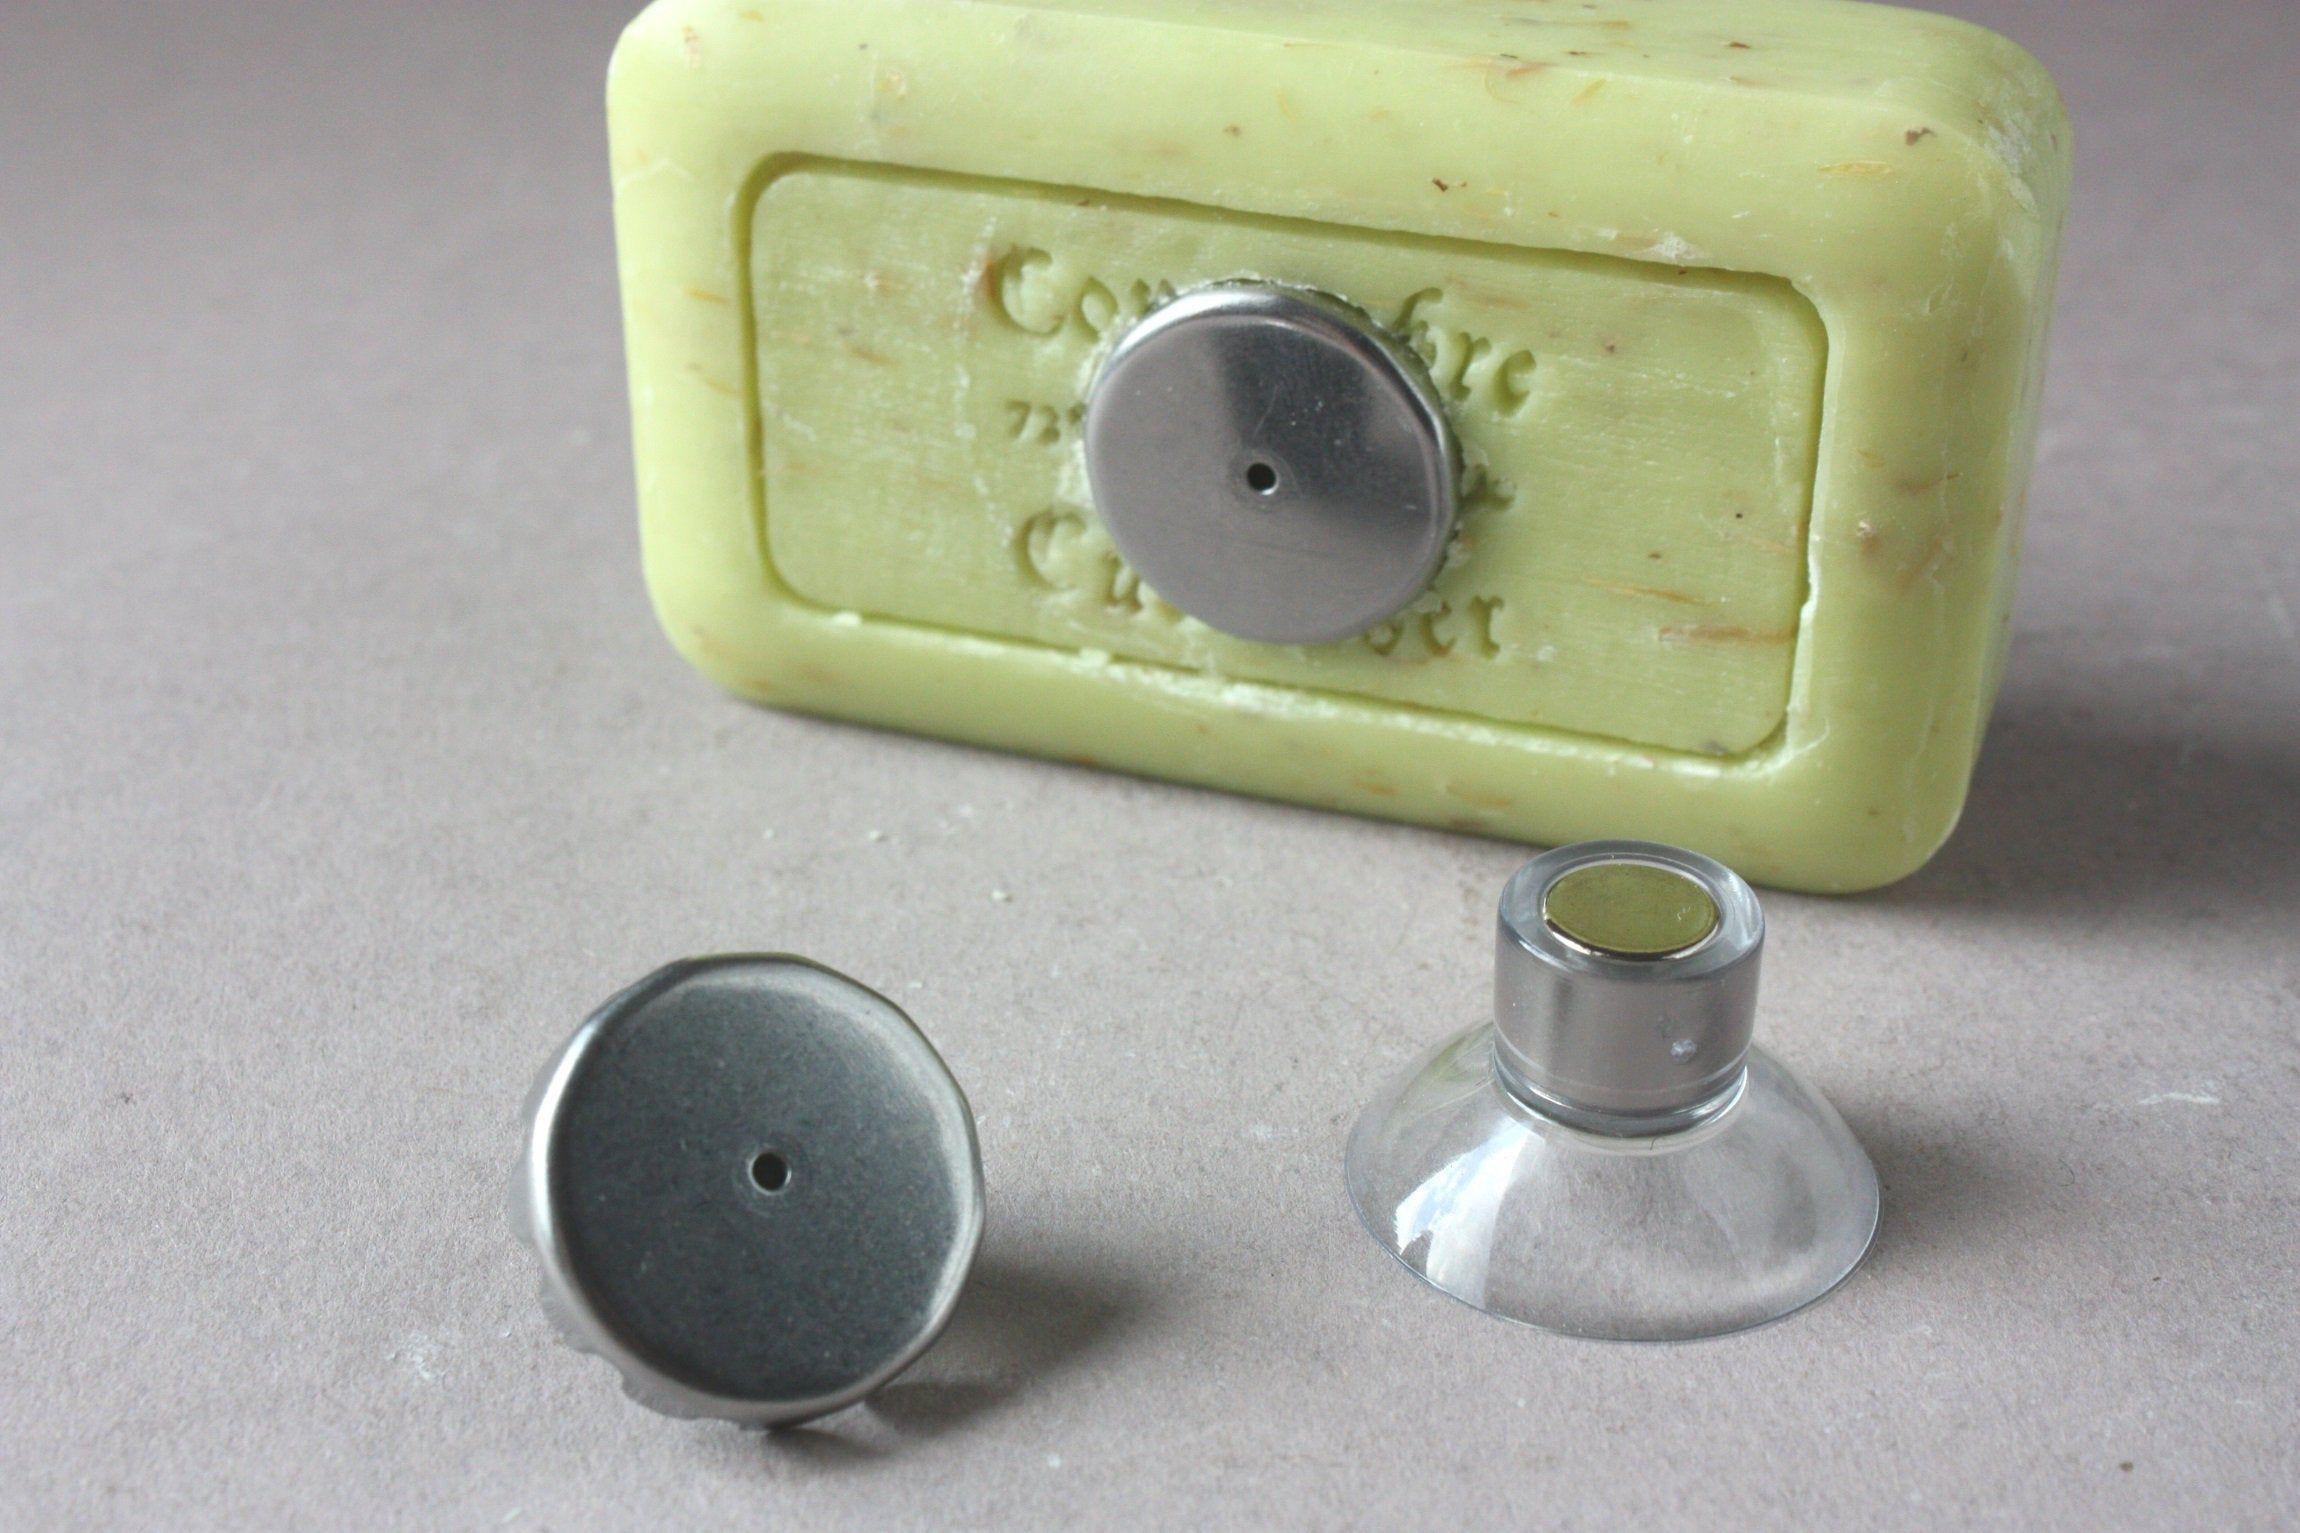 Cute Eggs Design Toothbrush Holder Suction Hooks Cups Organizer Bathroom Accessories Toothbrush Holder C Zahnburstenhalter Wand Zahnburstenhalter Wandhalterung